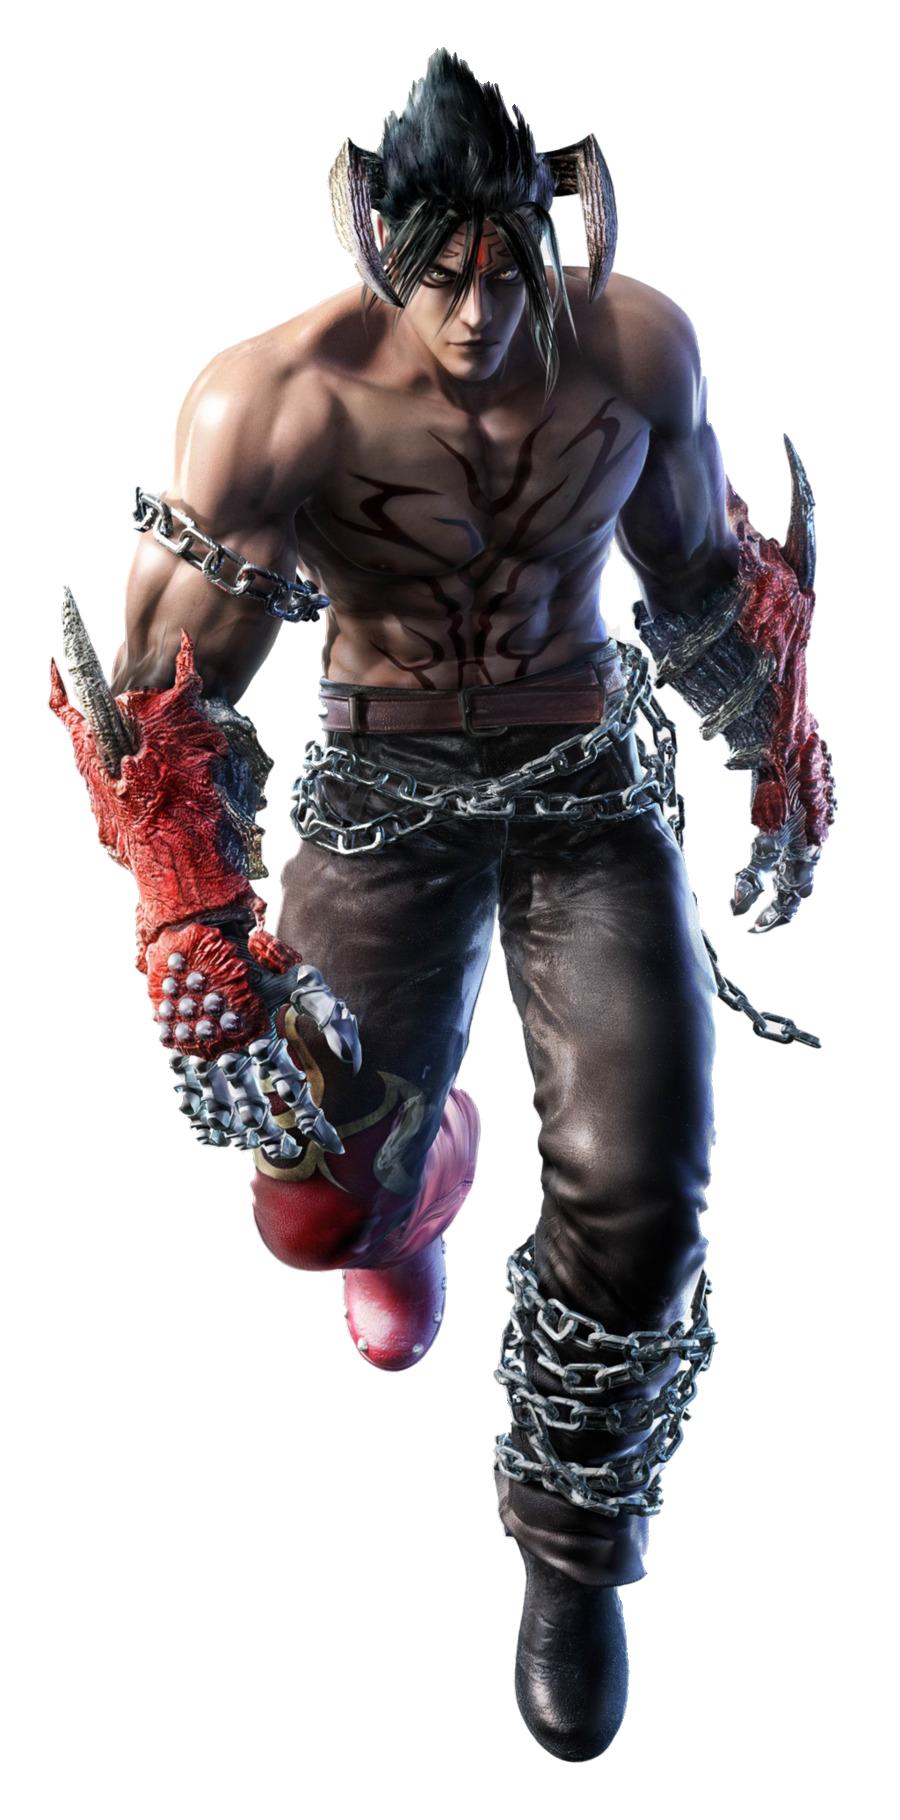 Tekken Character Transparent PNG